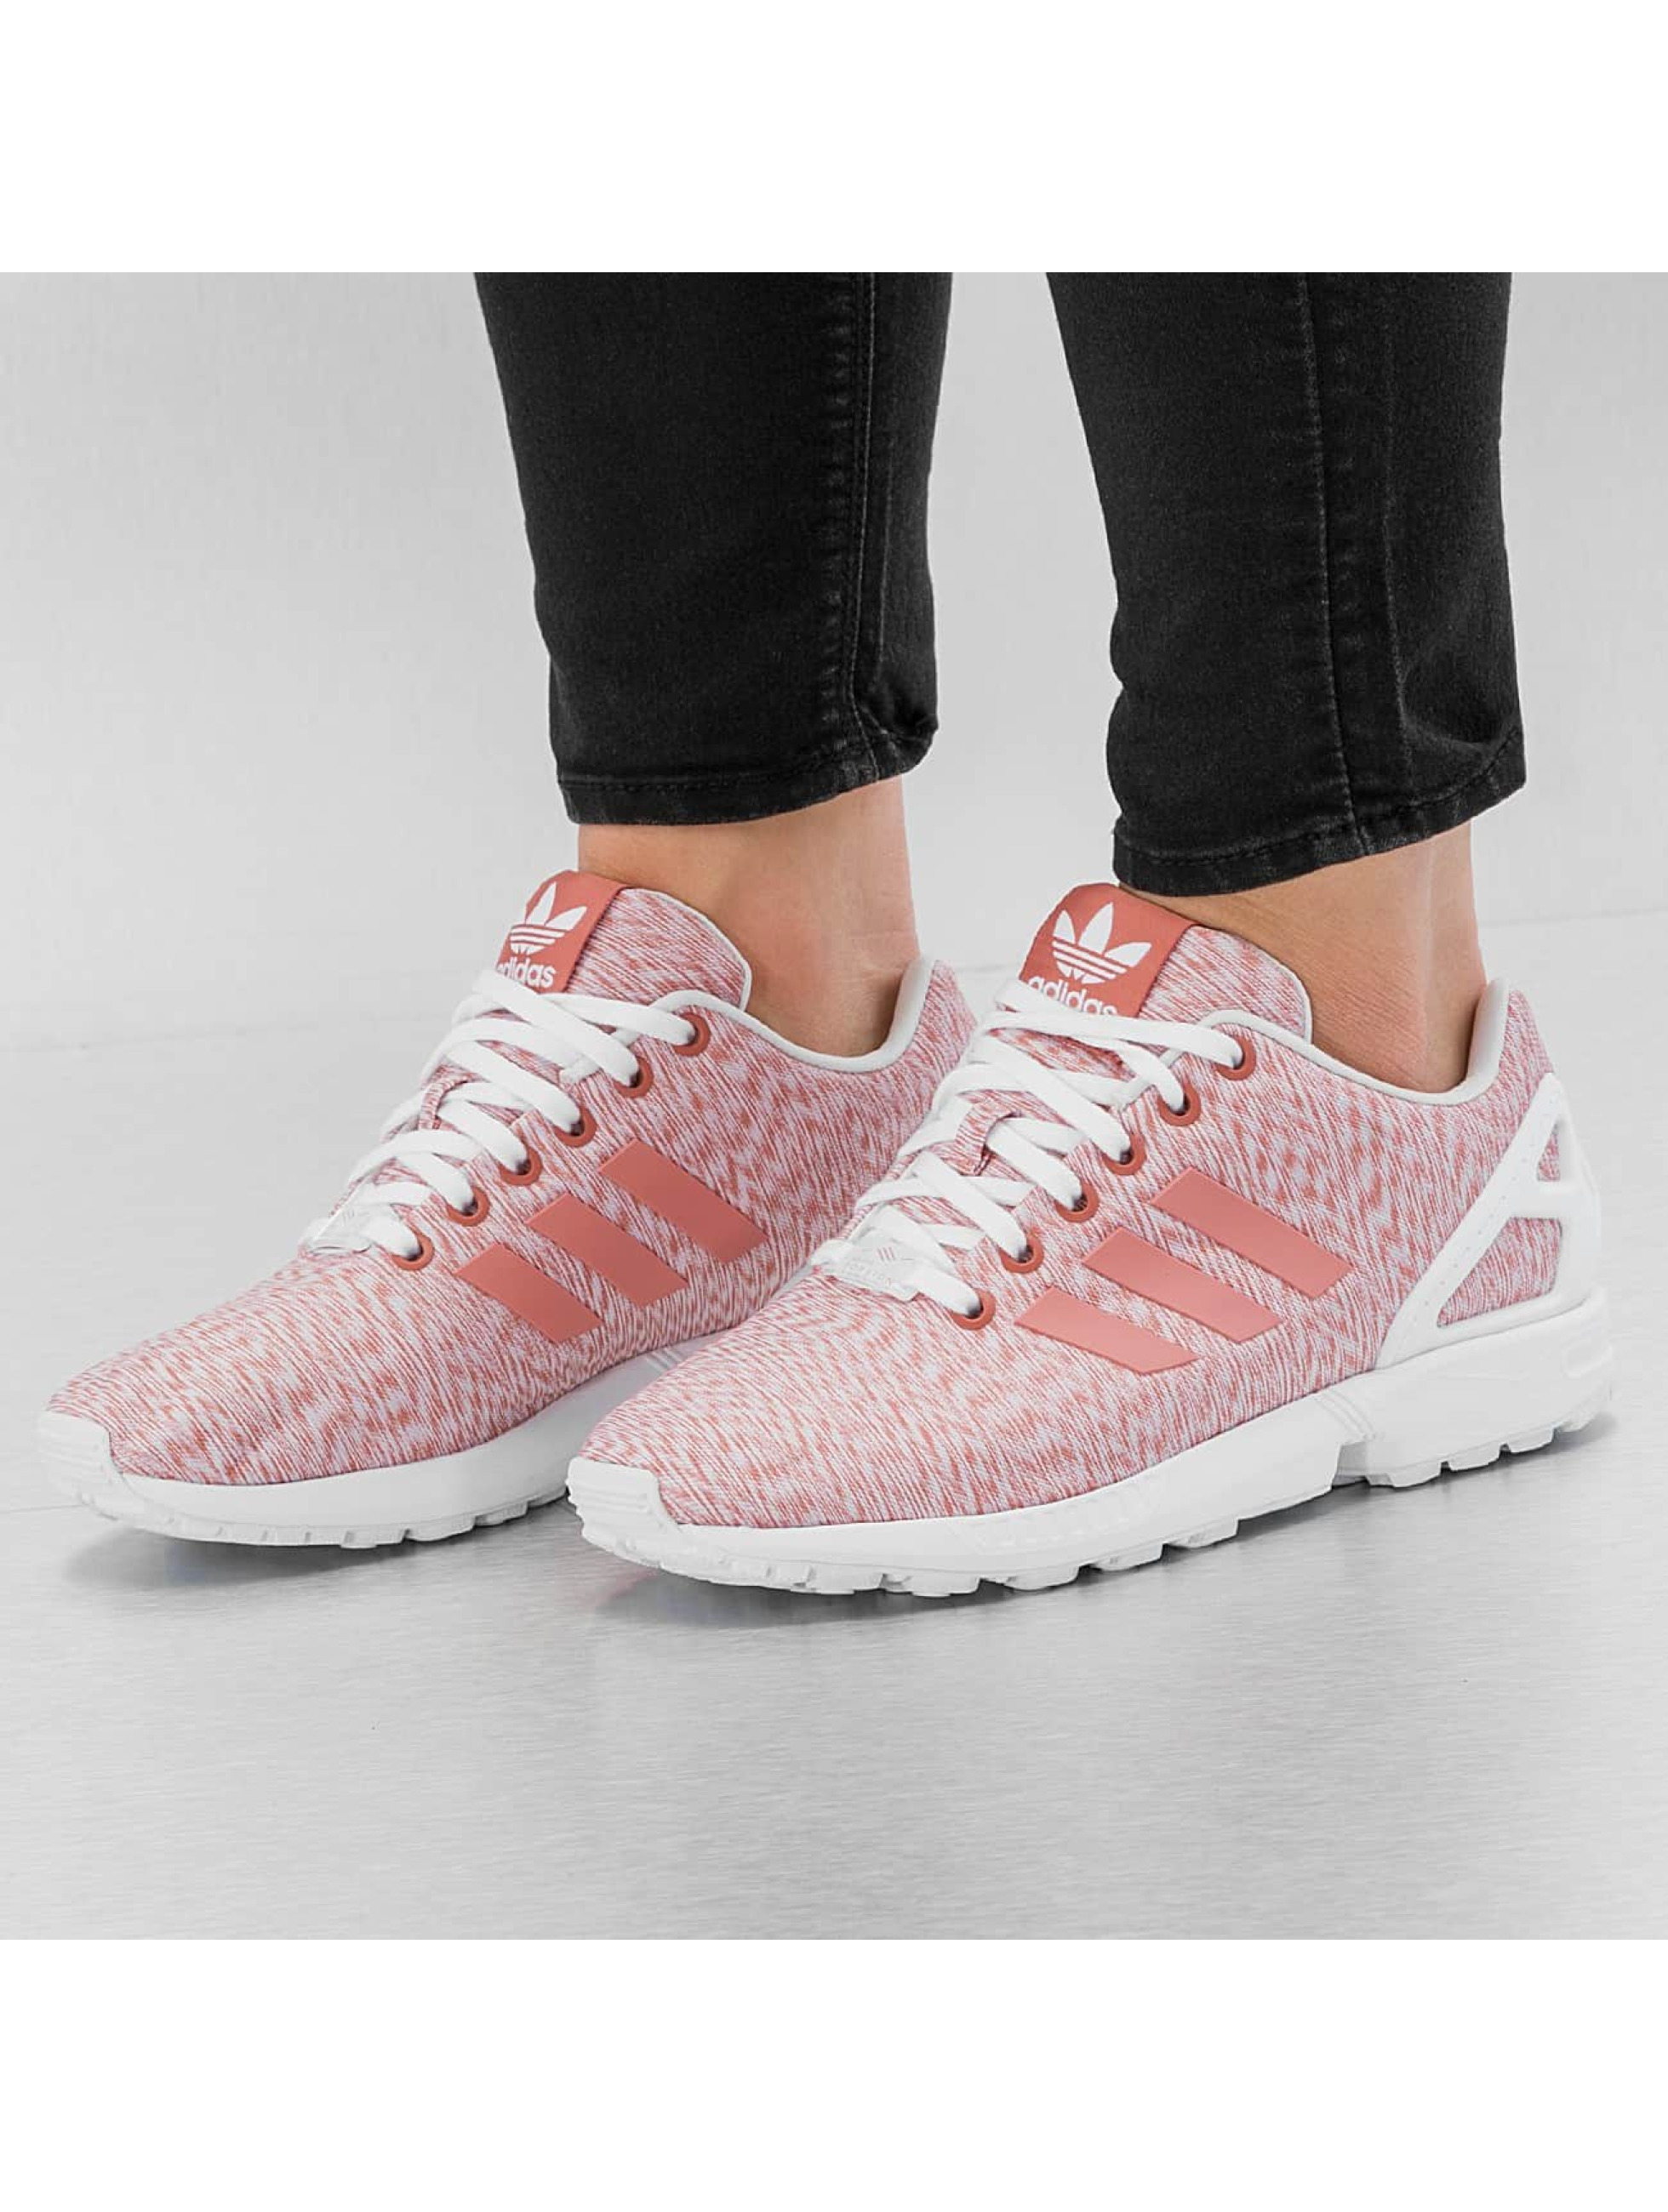 zx flux adidas pink